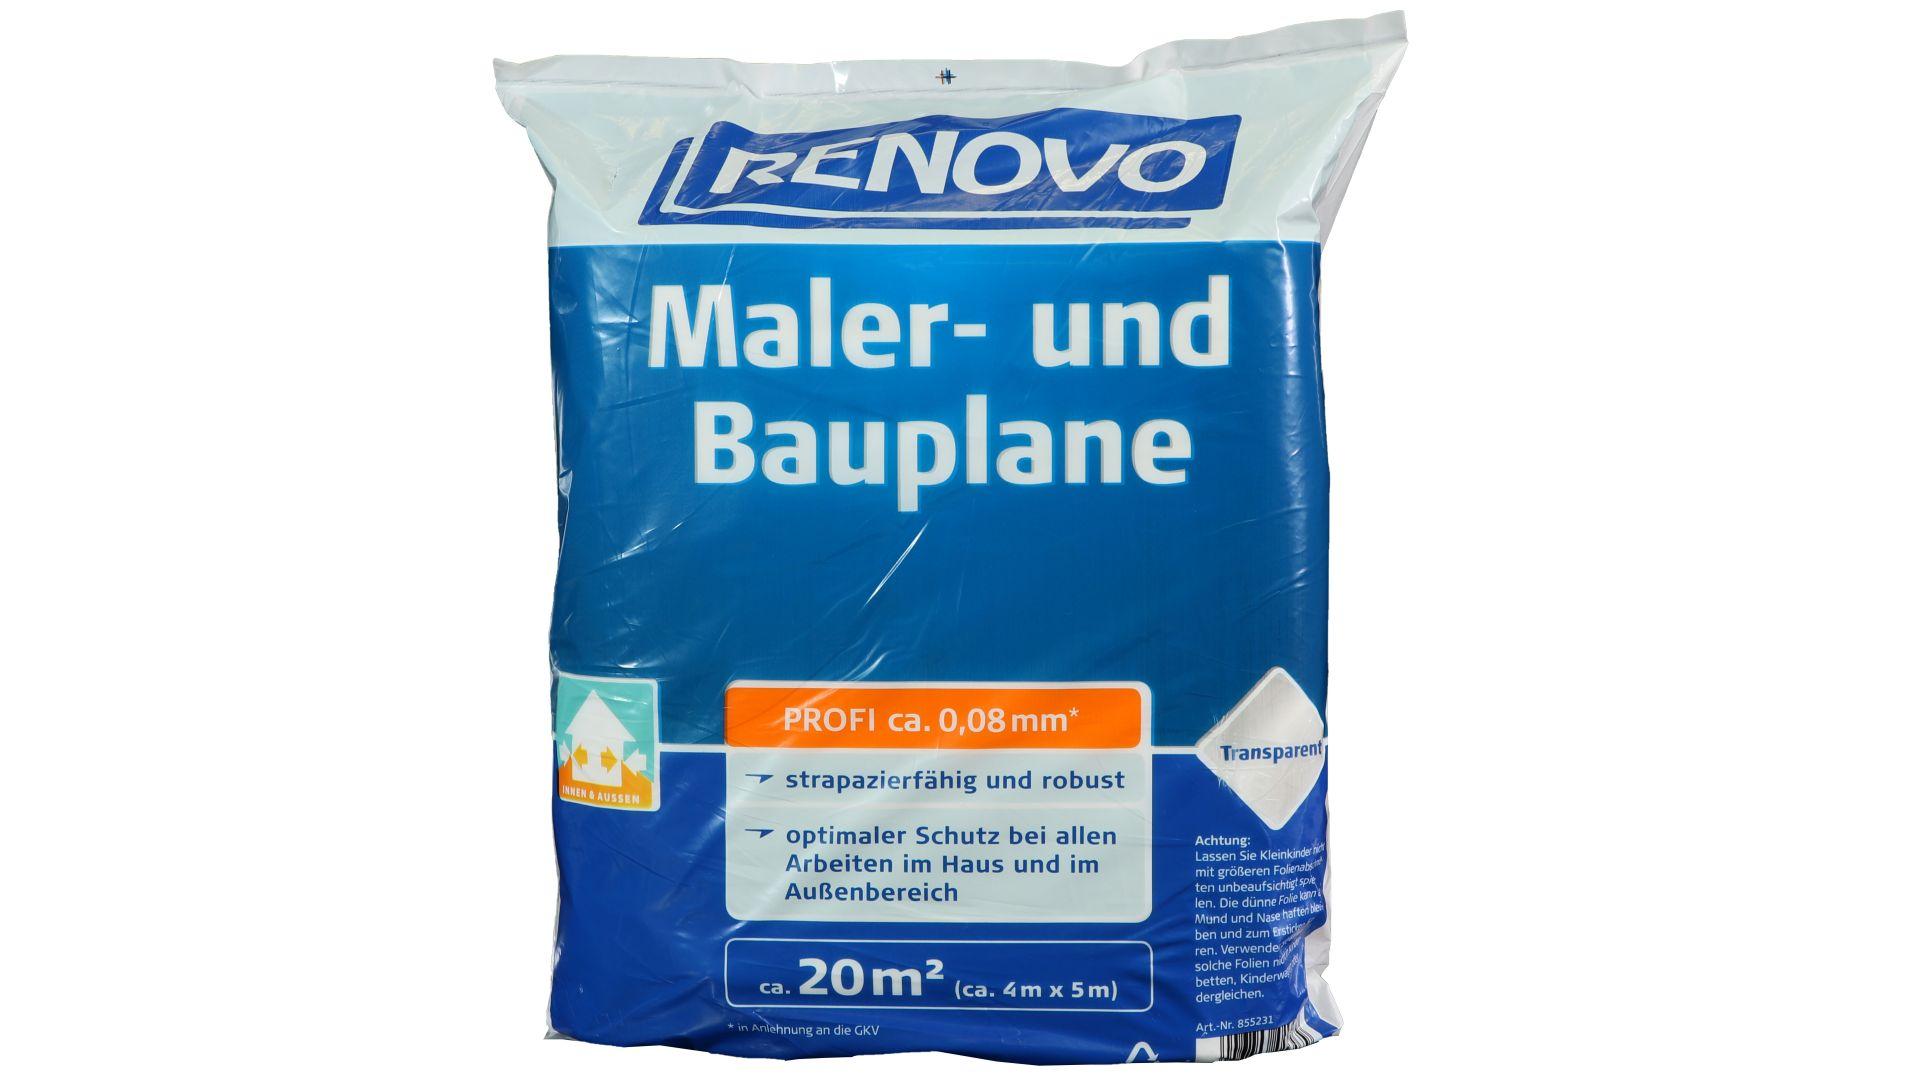 RENOVO Maler- und Bauplane Profi, transparent, 5 x 4 m x 80 µm